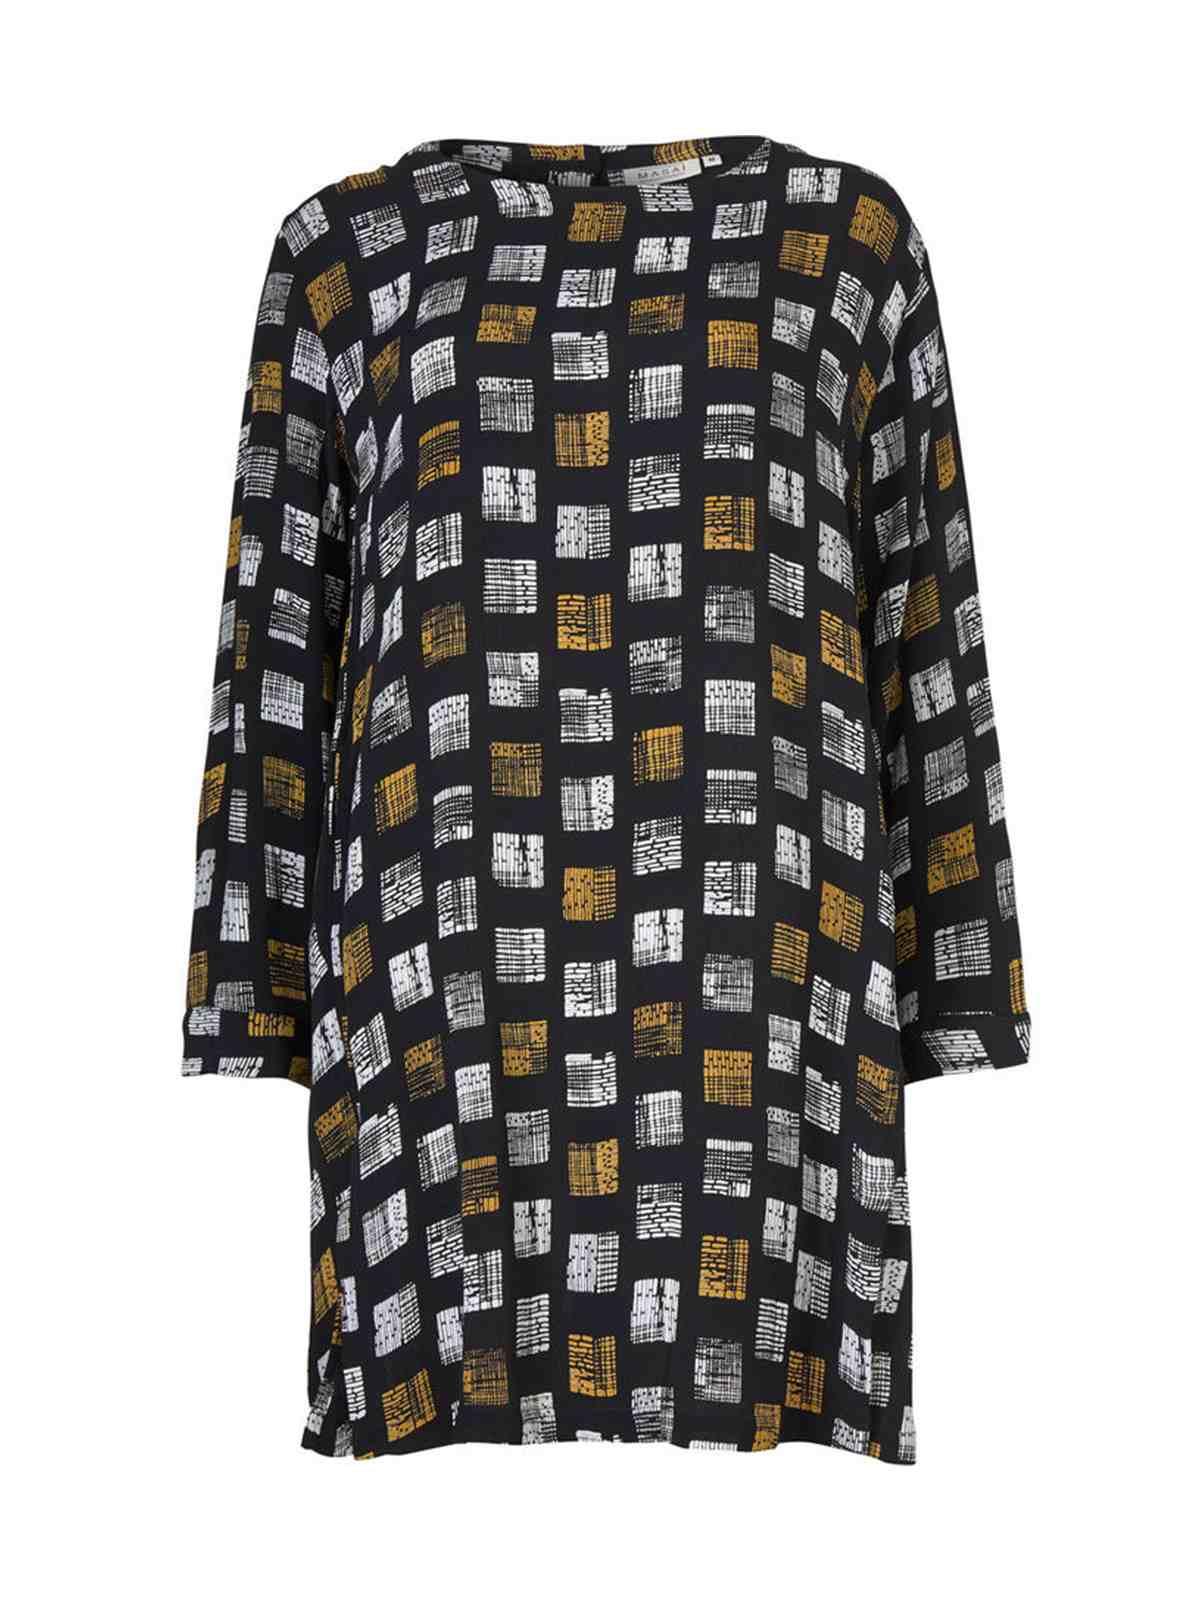 3de6792921286 Goa Tunic - Katie Kerr - Women's Clothing - UK